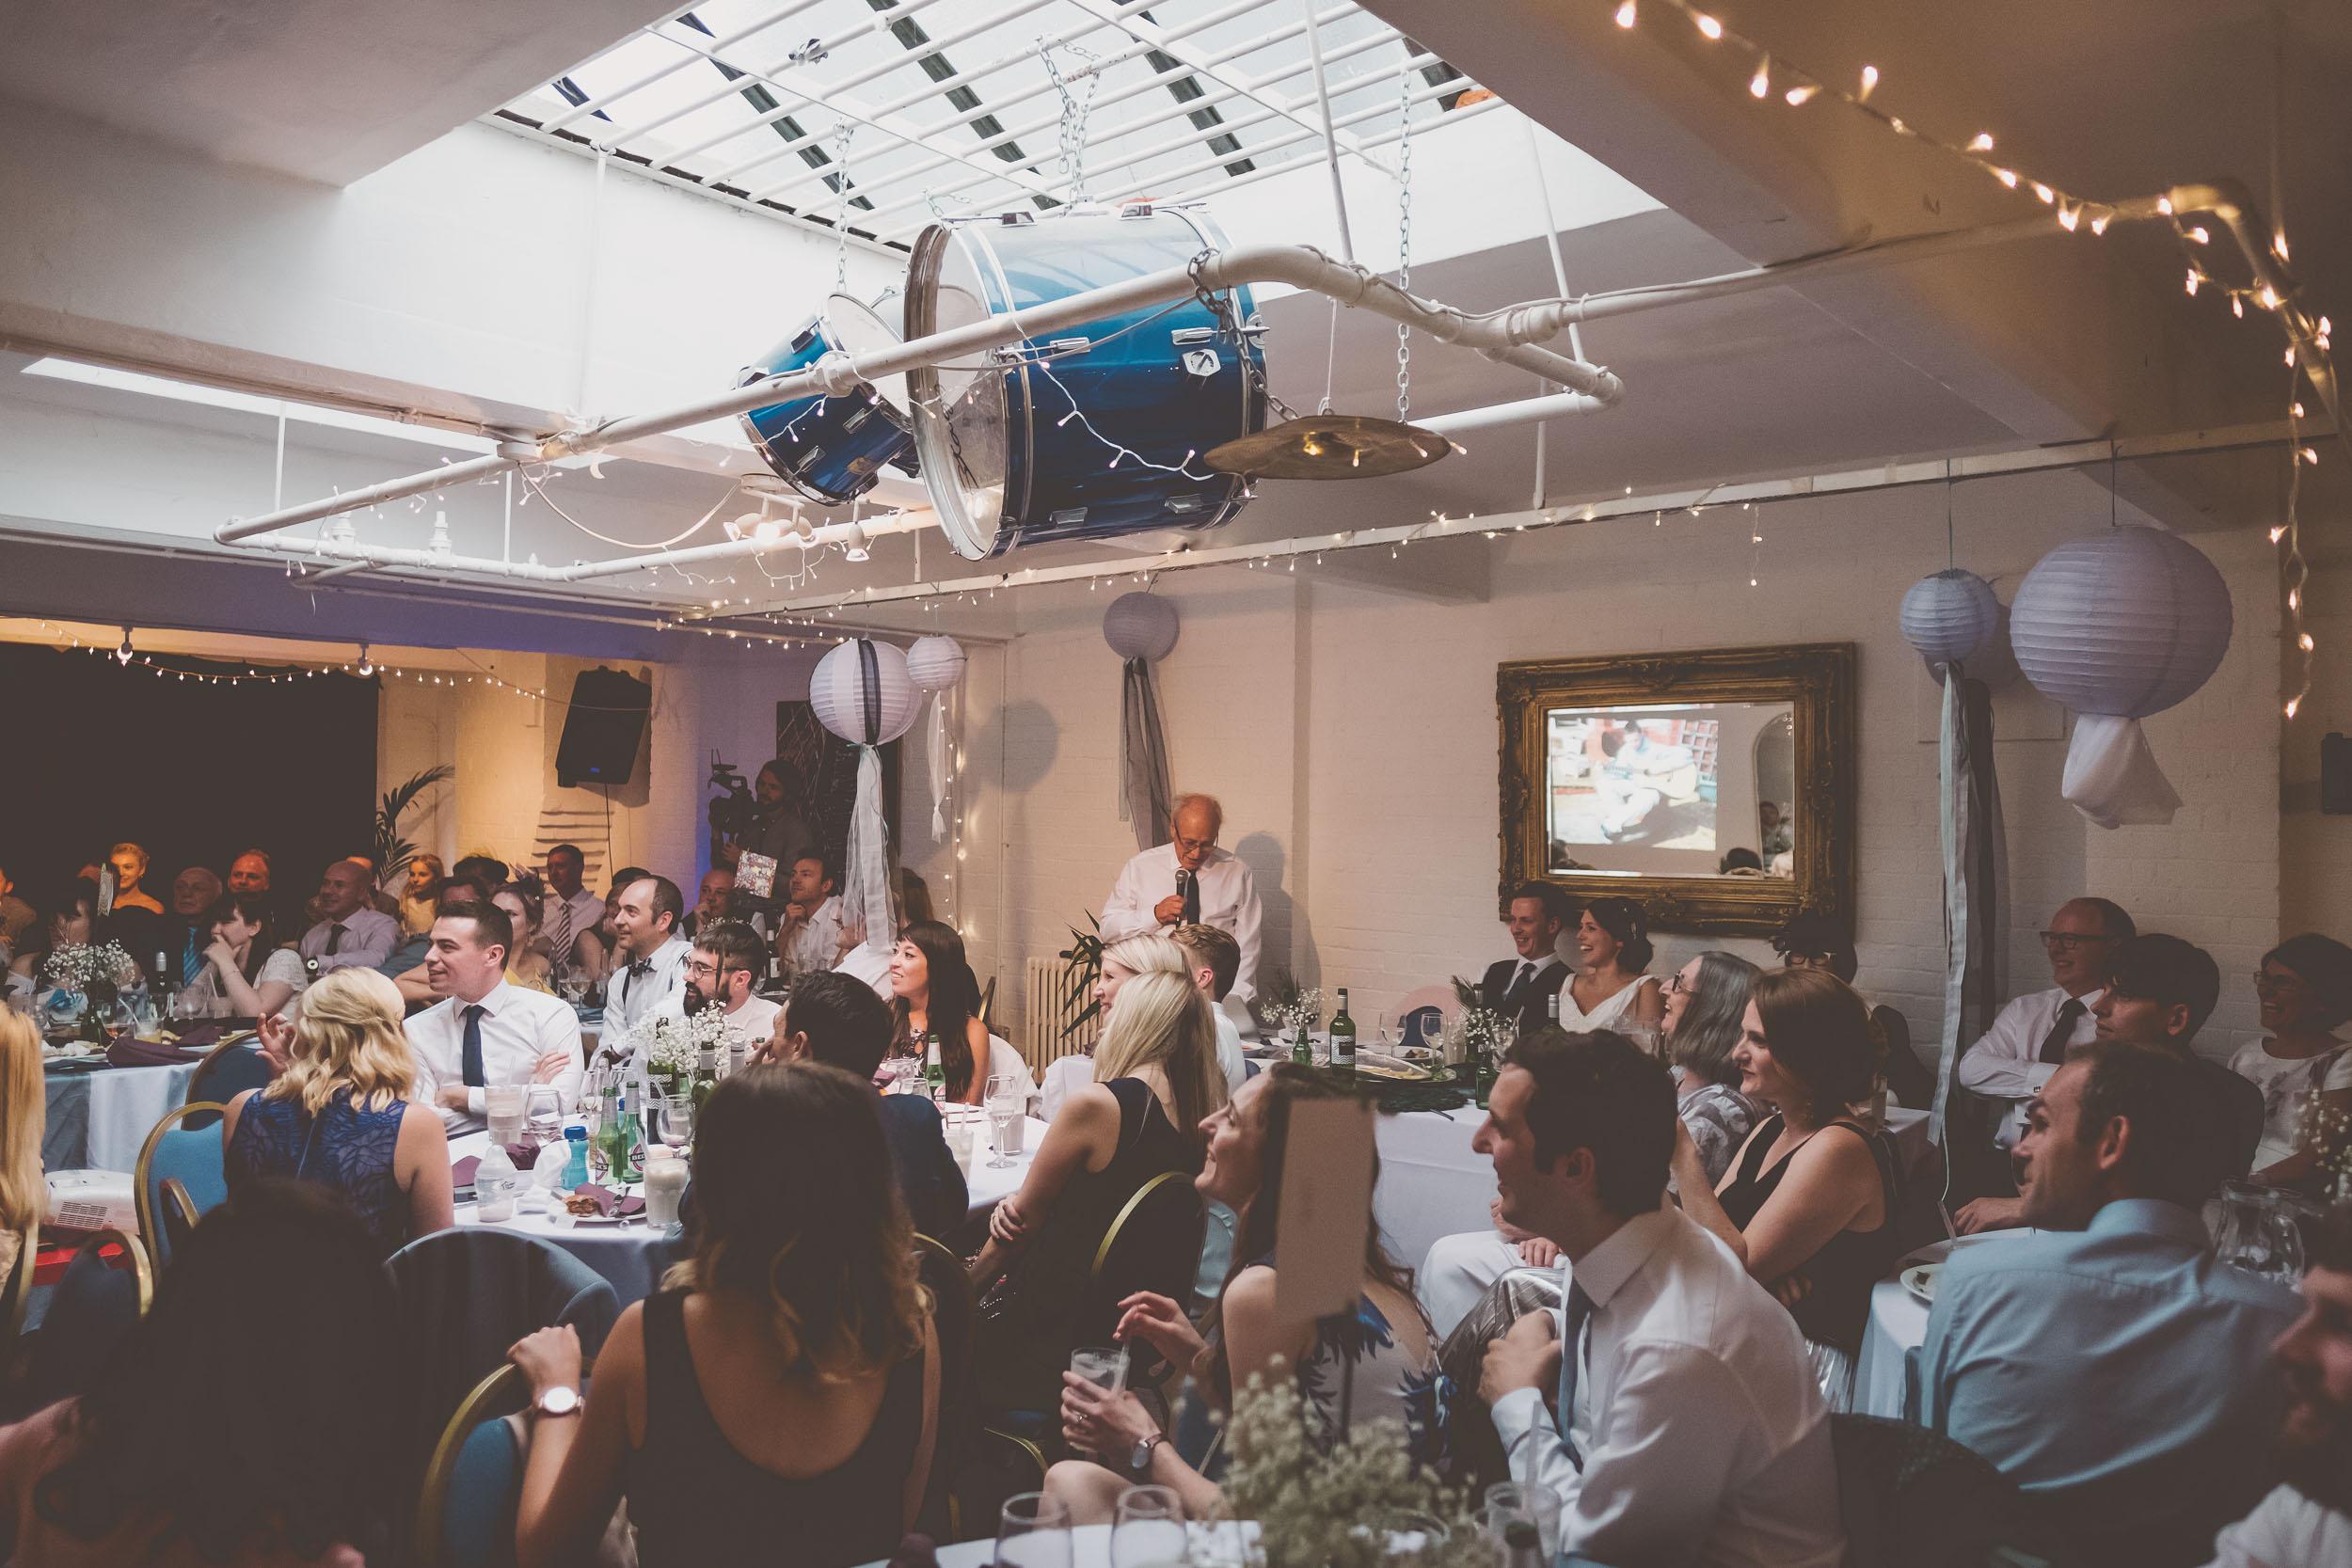 islington-town-hall-4th-floor-studios-wedding366.jpg